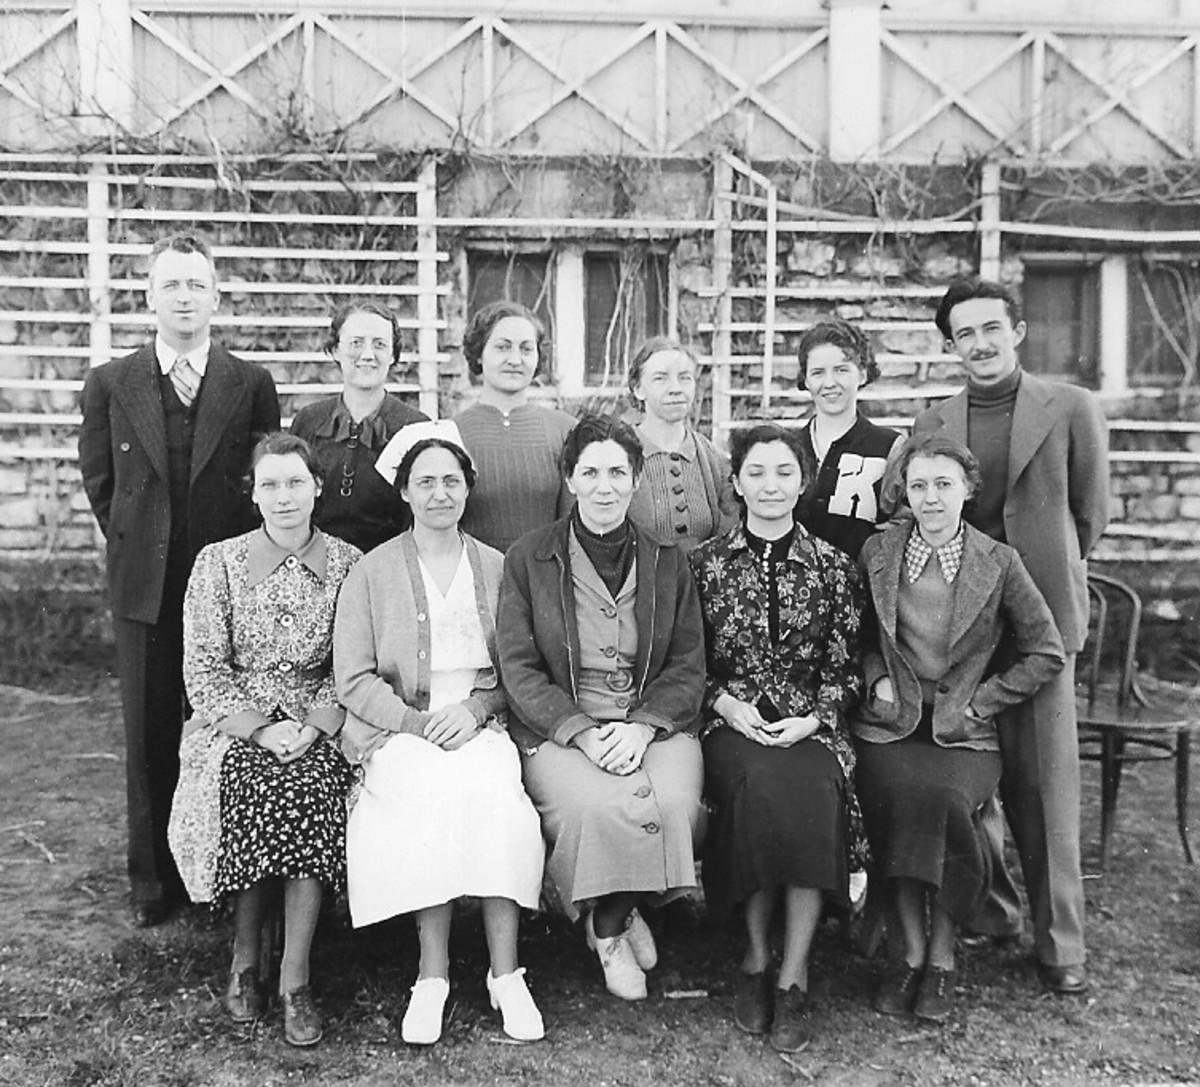 National Youth Administration, Zara, Kansas